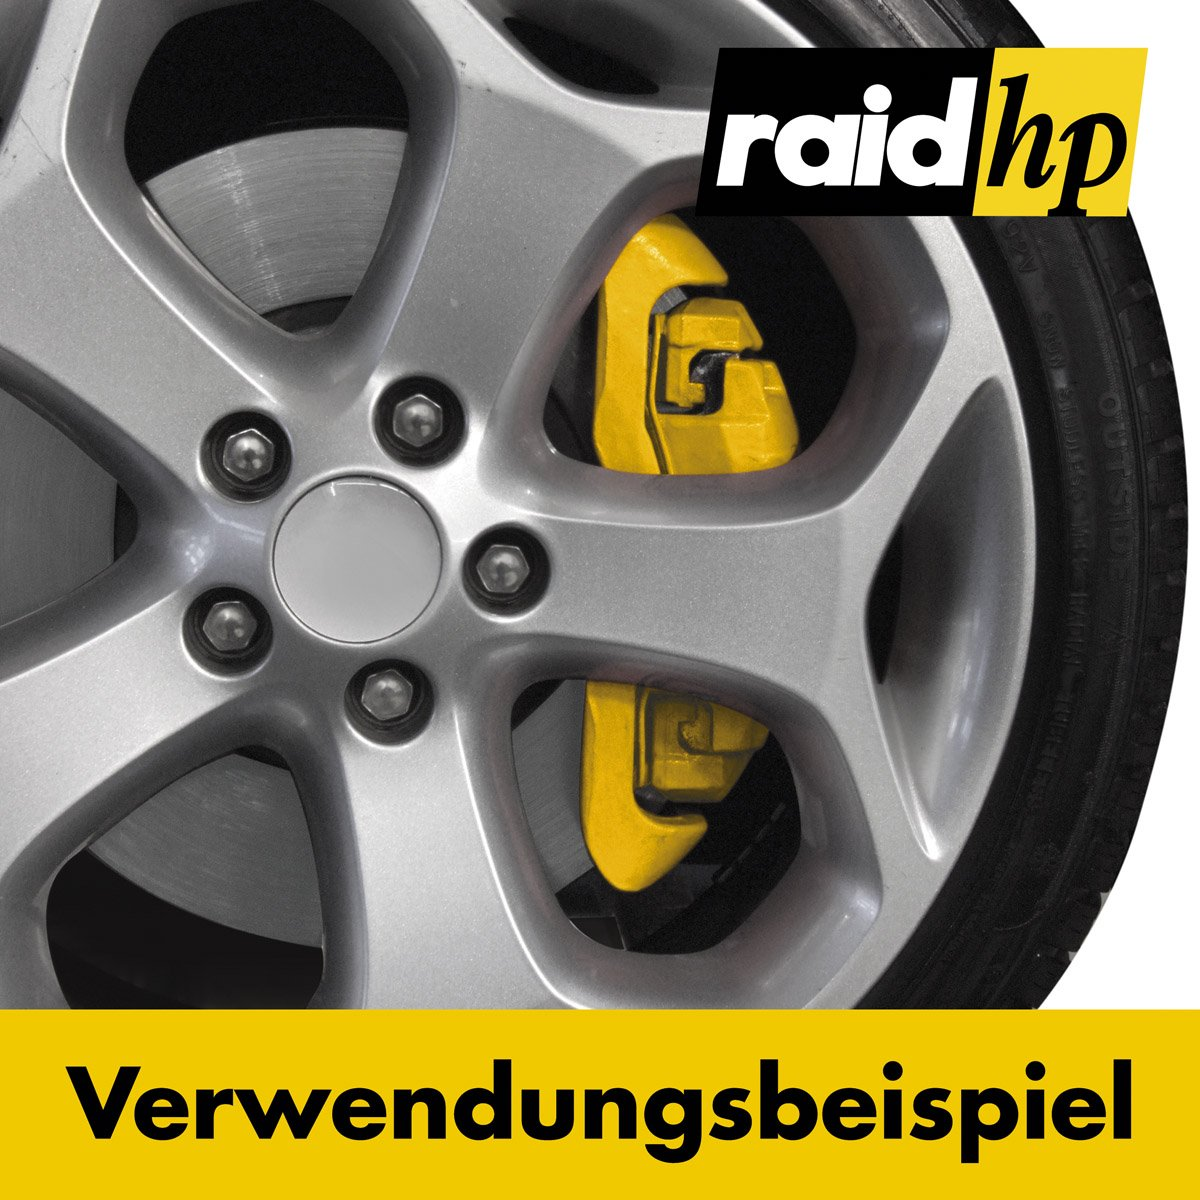 raid hp 350005 Bremssattellack Set GR/ÜN-GL/ÄNZEND